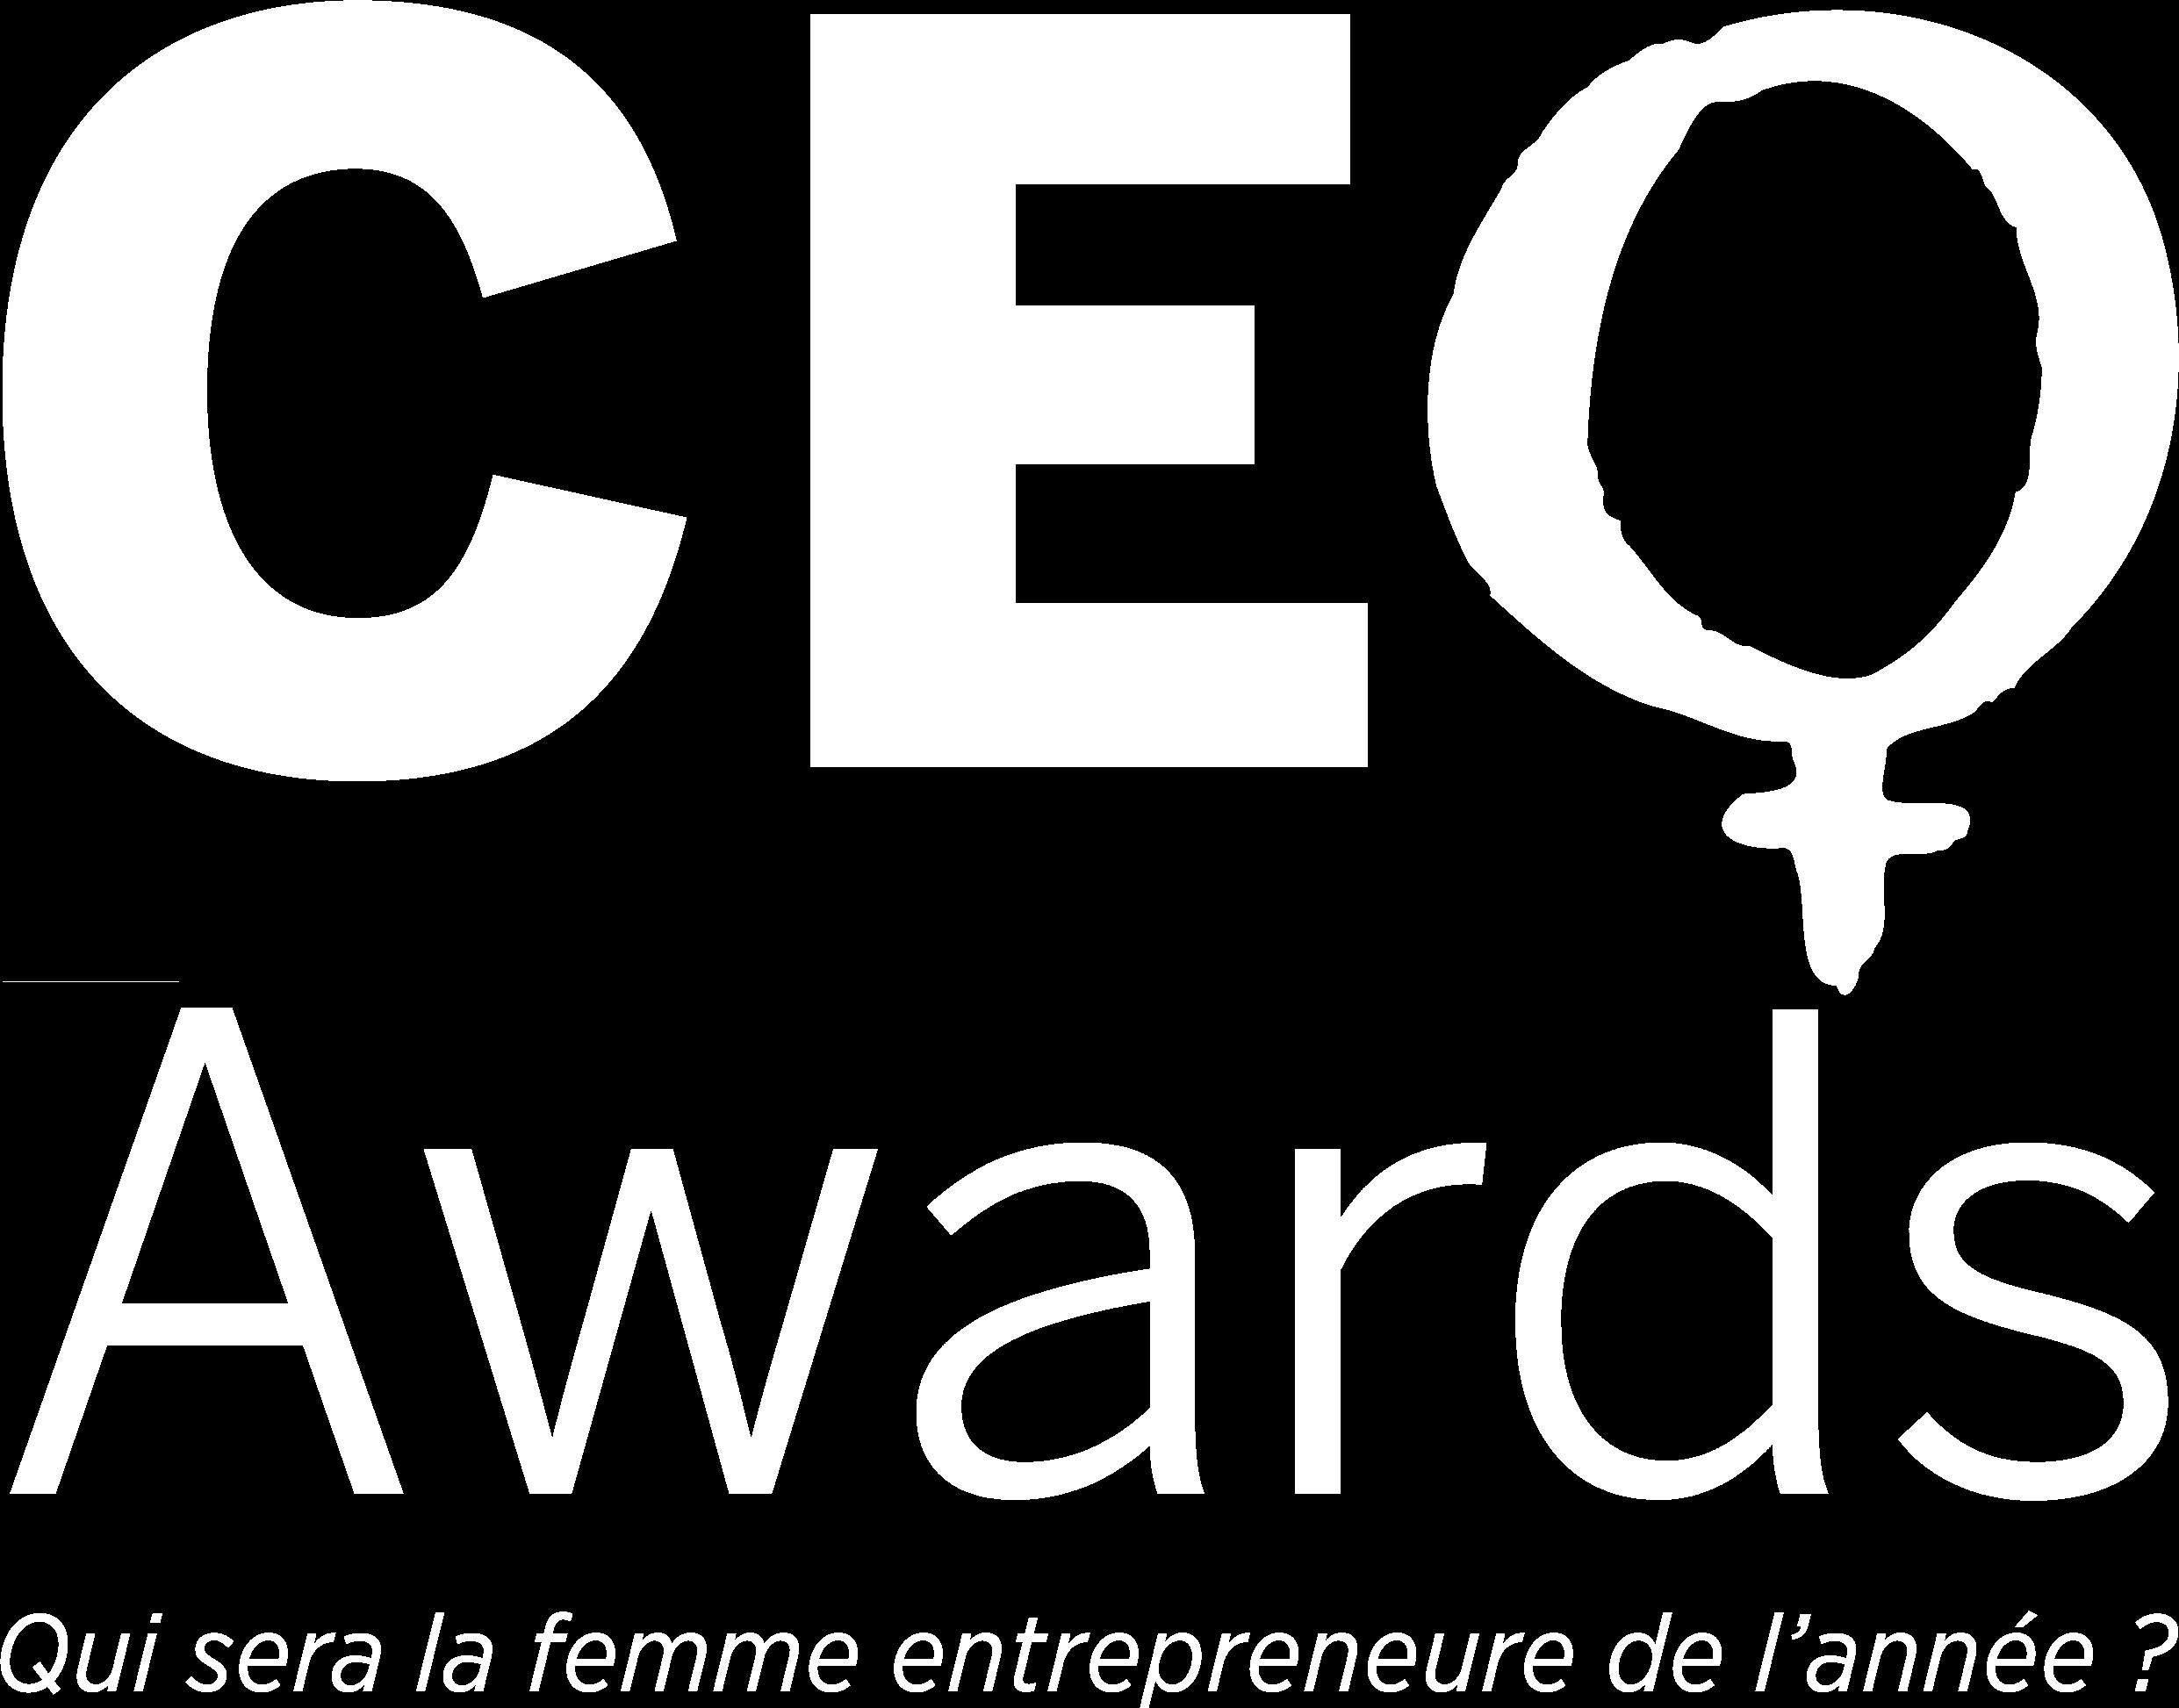 CEO Awards